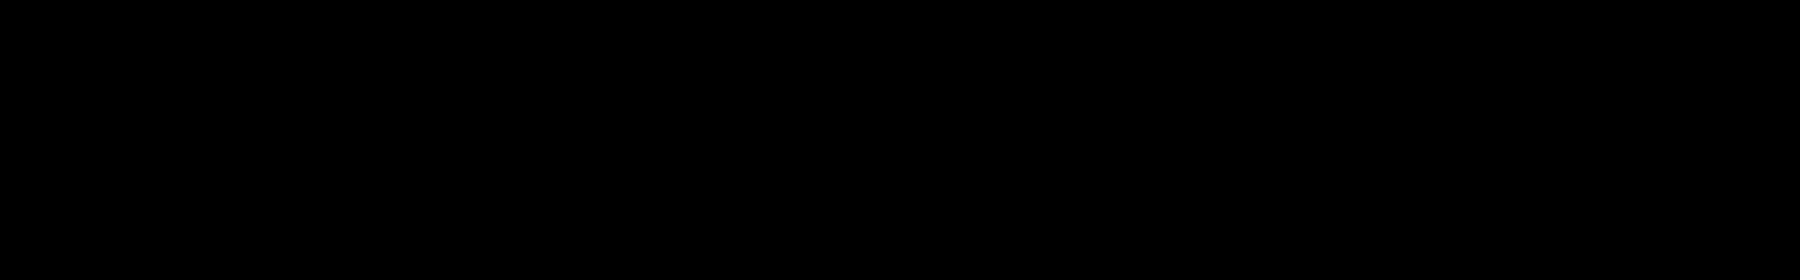 Draco Island audio waveform